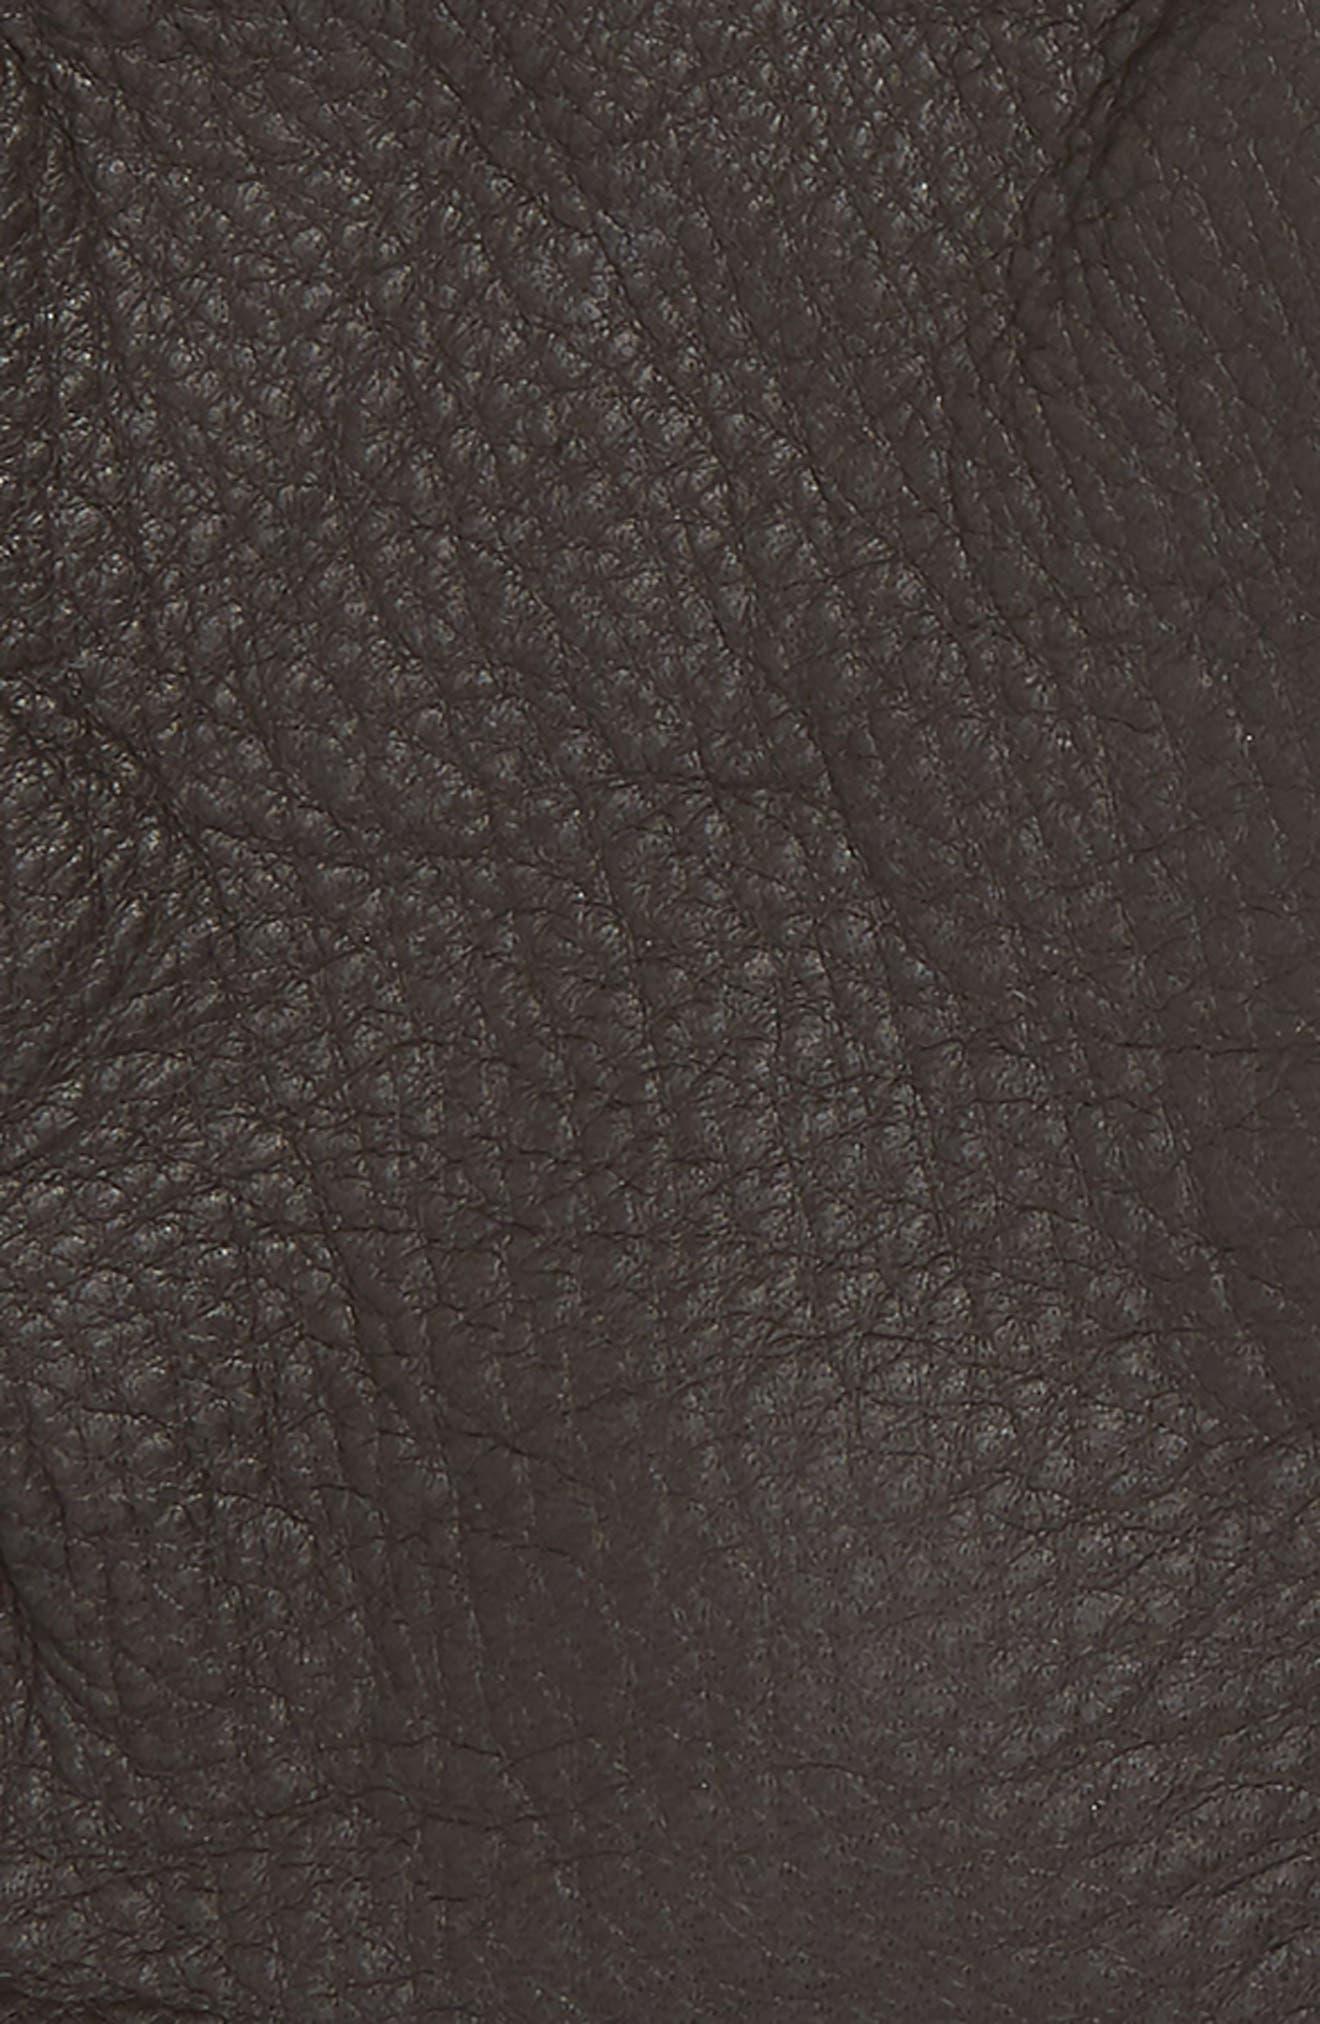 POLO RALPH LAUREN, Deerskin Gloves, Alternate thumbnail 3, color, CIRCUIT BROWN